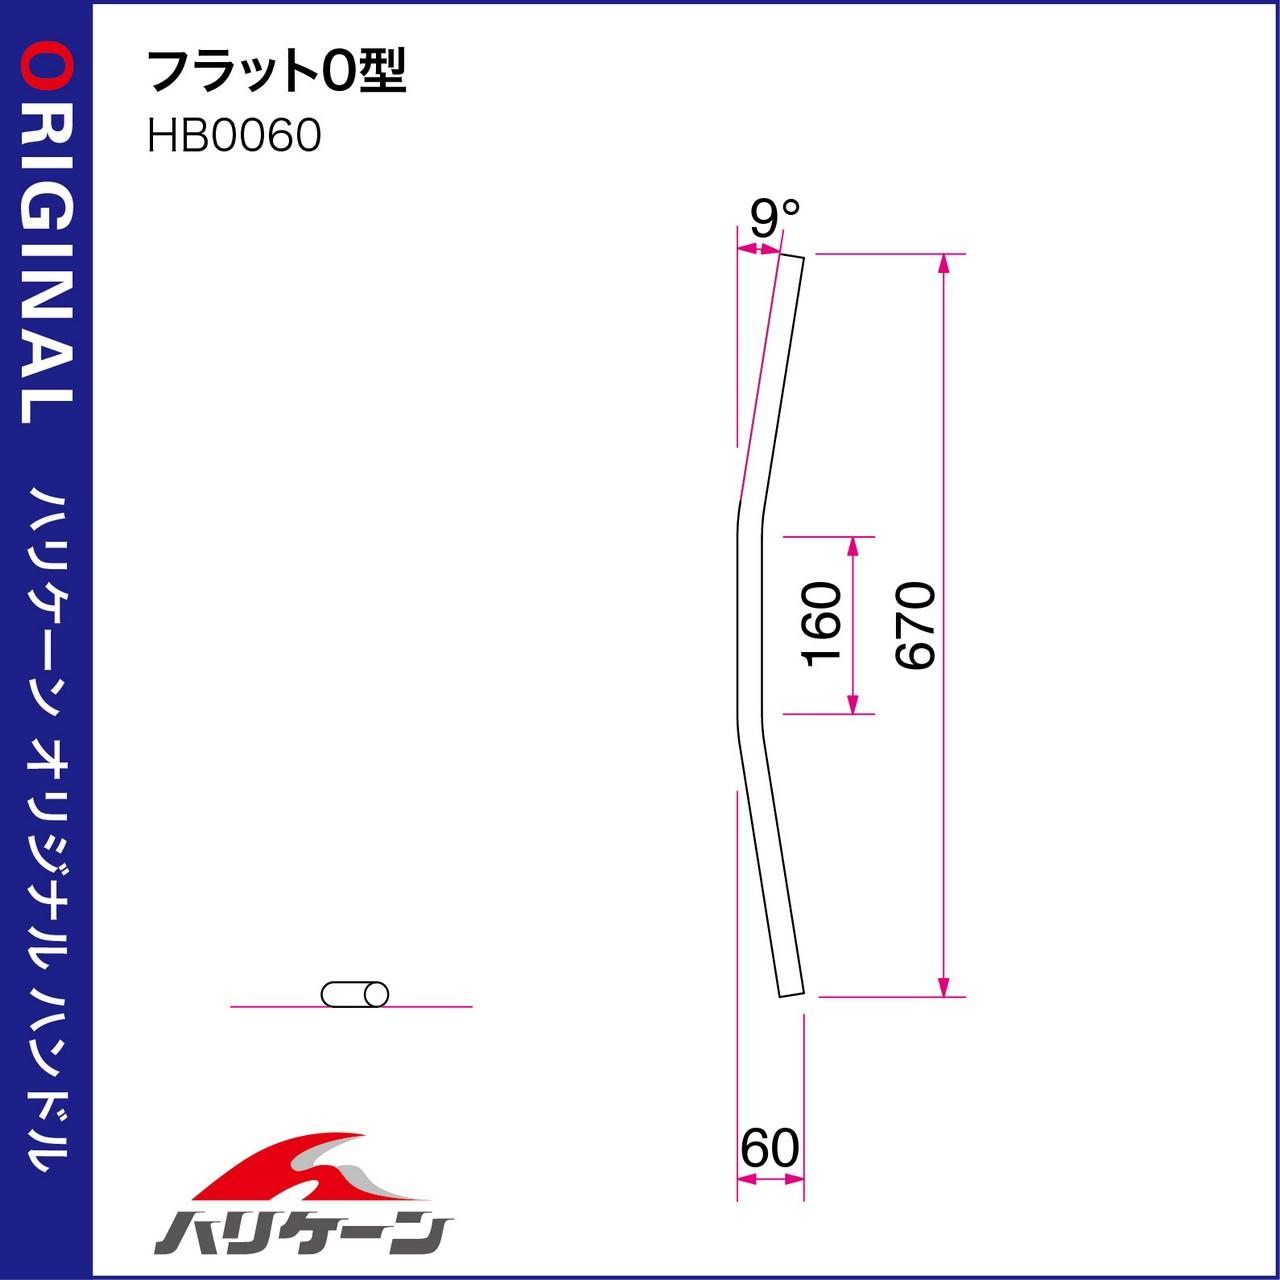 【HURRICANE】Flat Type 0 Φ 7/8 吋 鋼製把手 - 「Webike-摩托百貨」